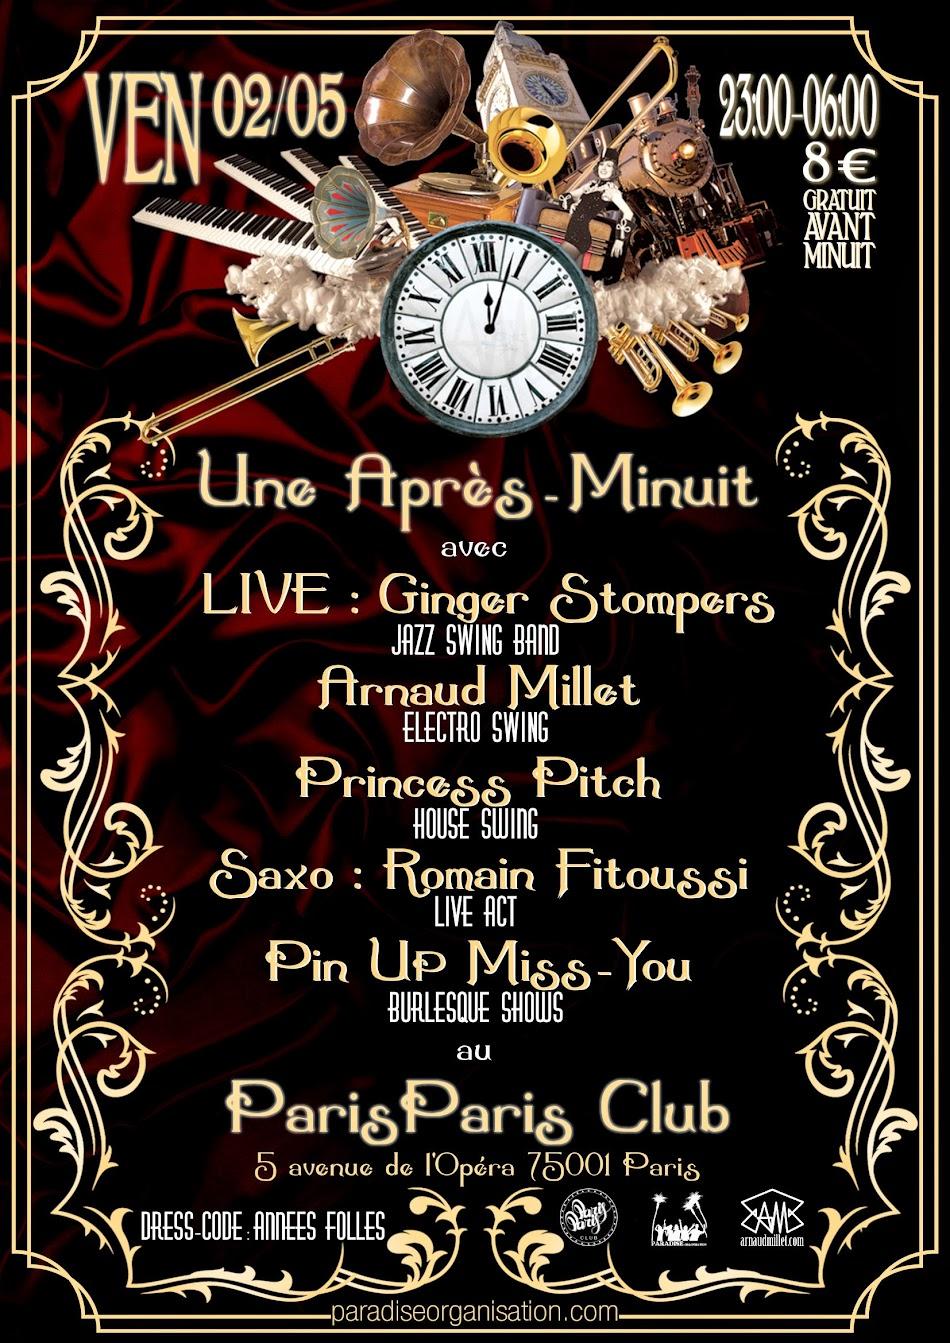 Paradise Organisation - Arnaud Millet - Une Après-Minuit - Vintage - Electro-Swing